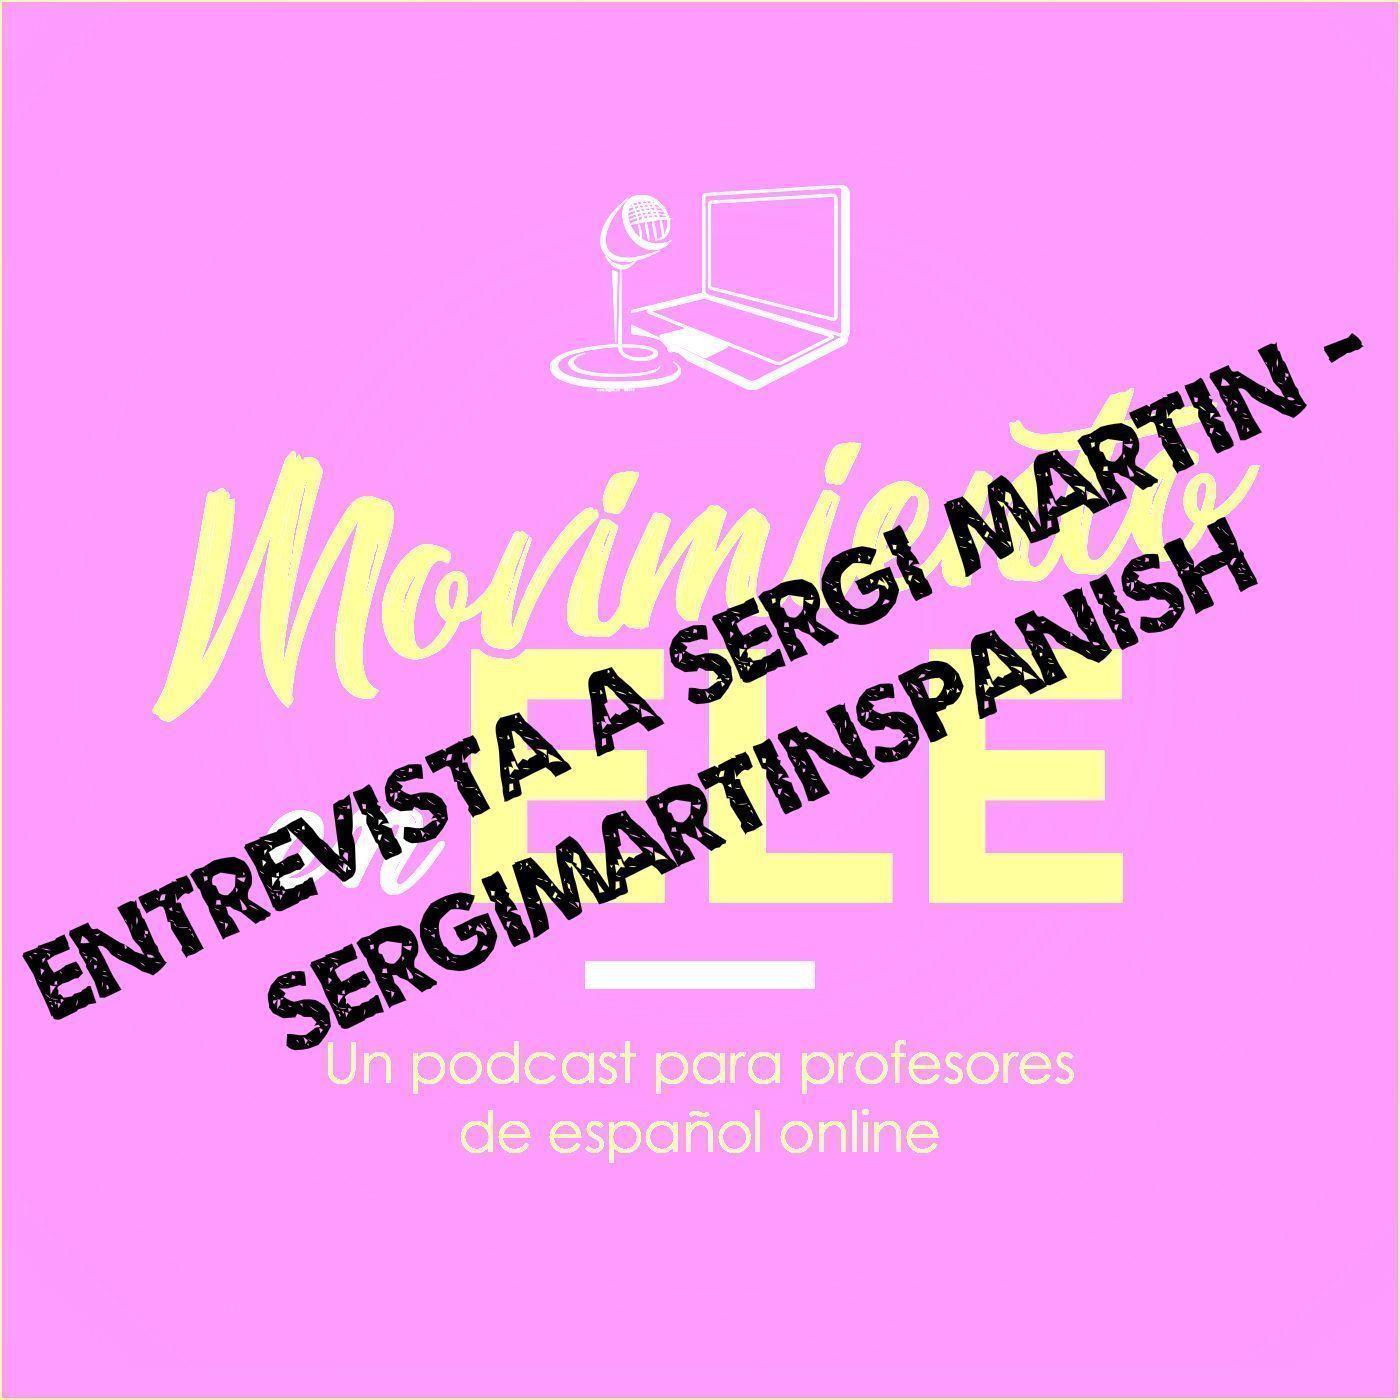 La vida de un profesor de español Youtuber – Entrevista a Sergi Martín (SergiMartinSpanish)